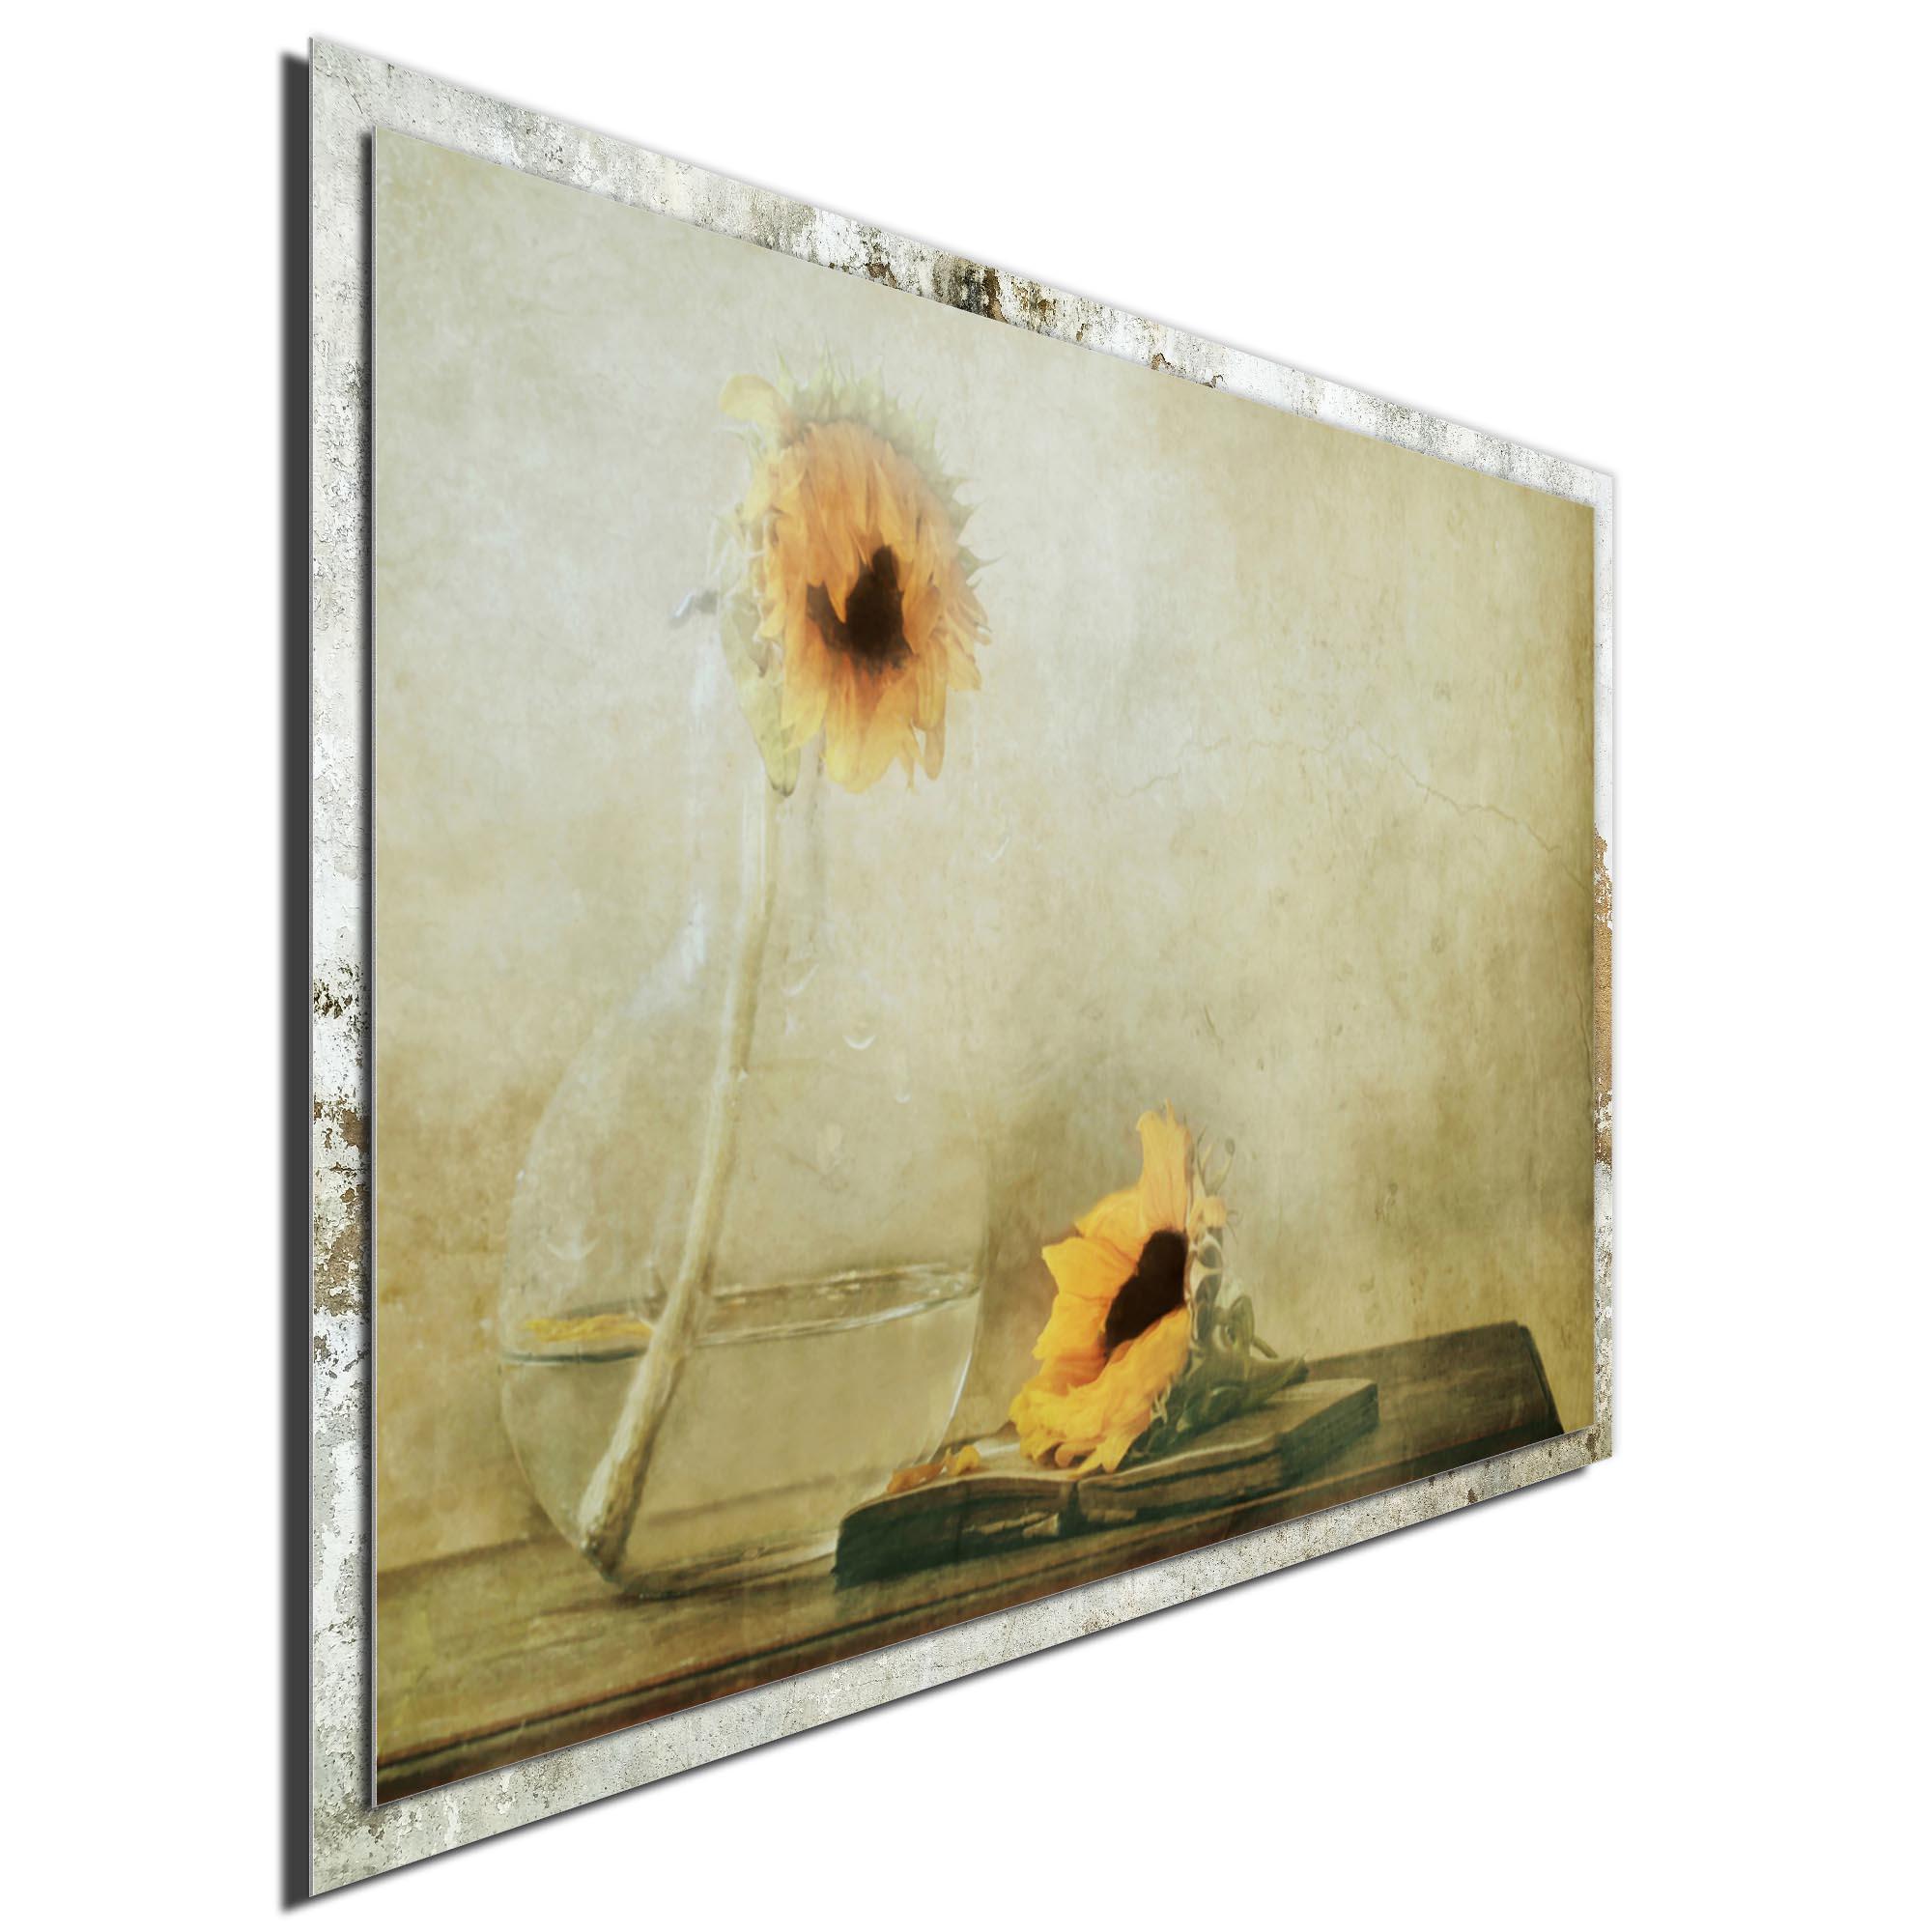 The Black Heart by Delphine Devos - Modern Farmhouse Floral on Metal - Image 2